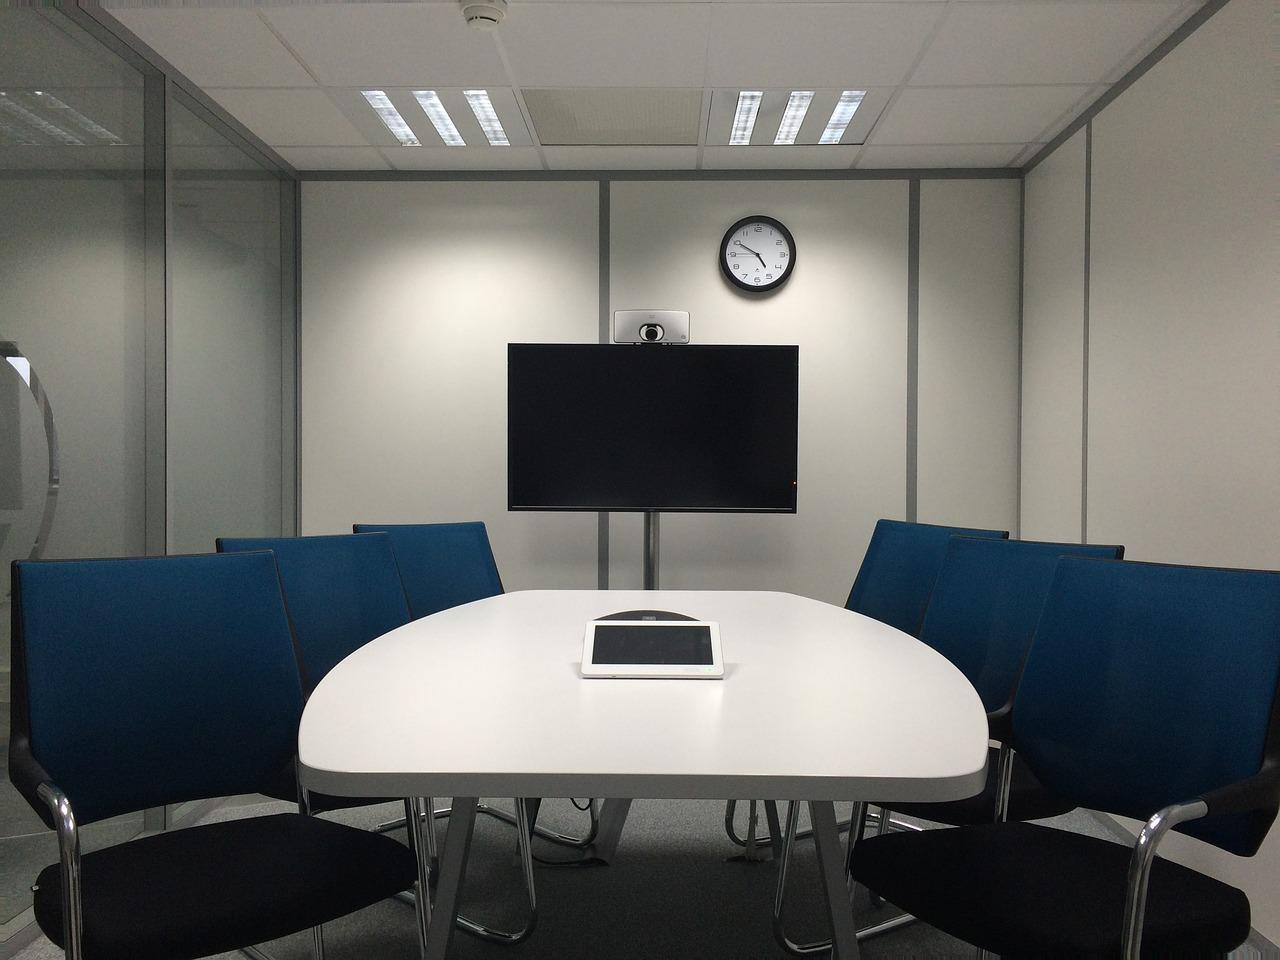 Legal meetings virtually